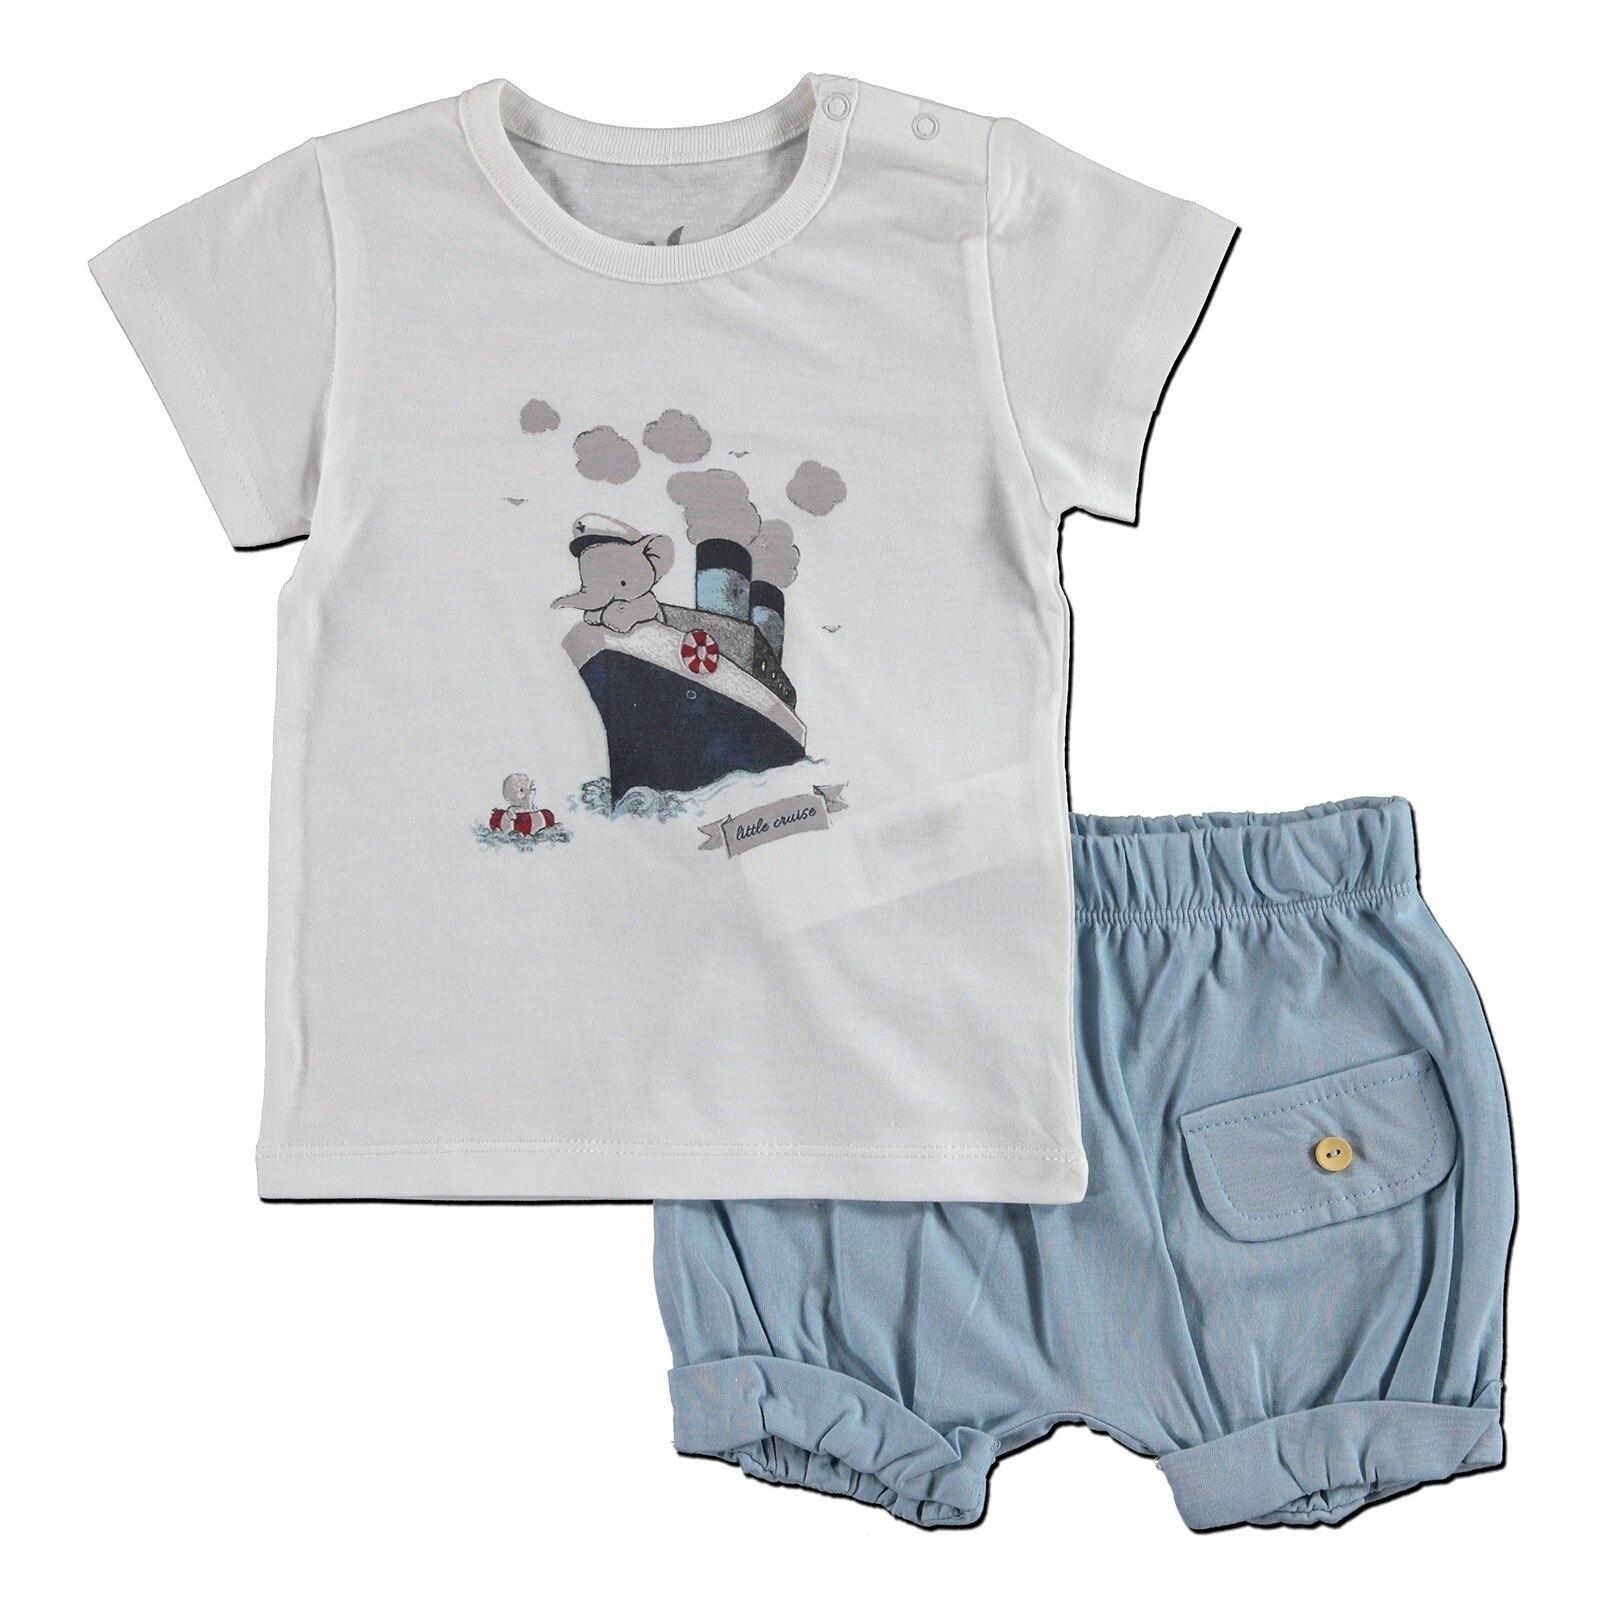 Ebebek Newborn Fashion Club Sailor Baby Boy Supreme T-shirt Short 2 Pcs Set